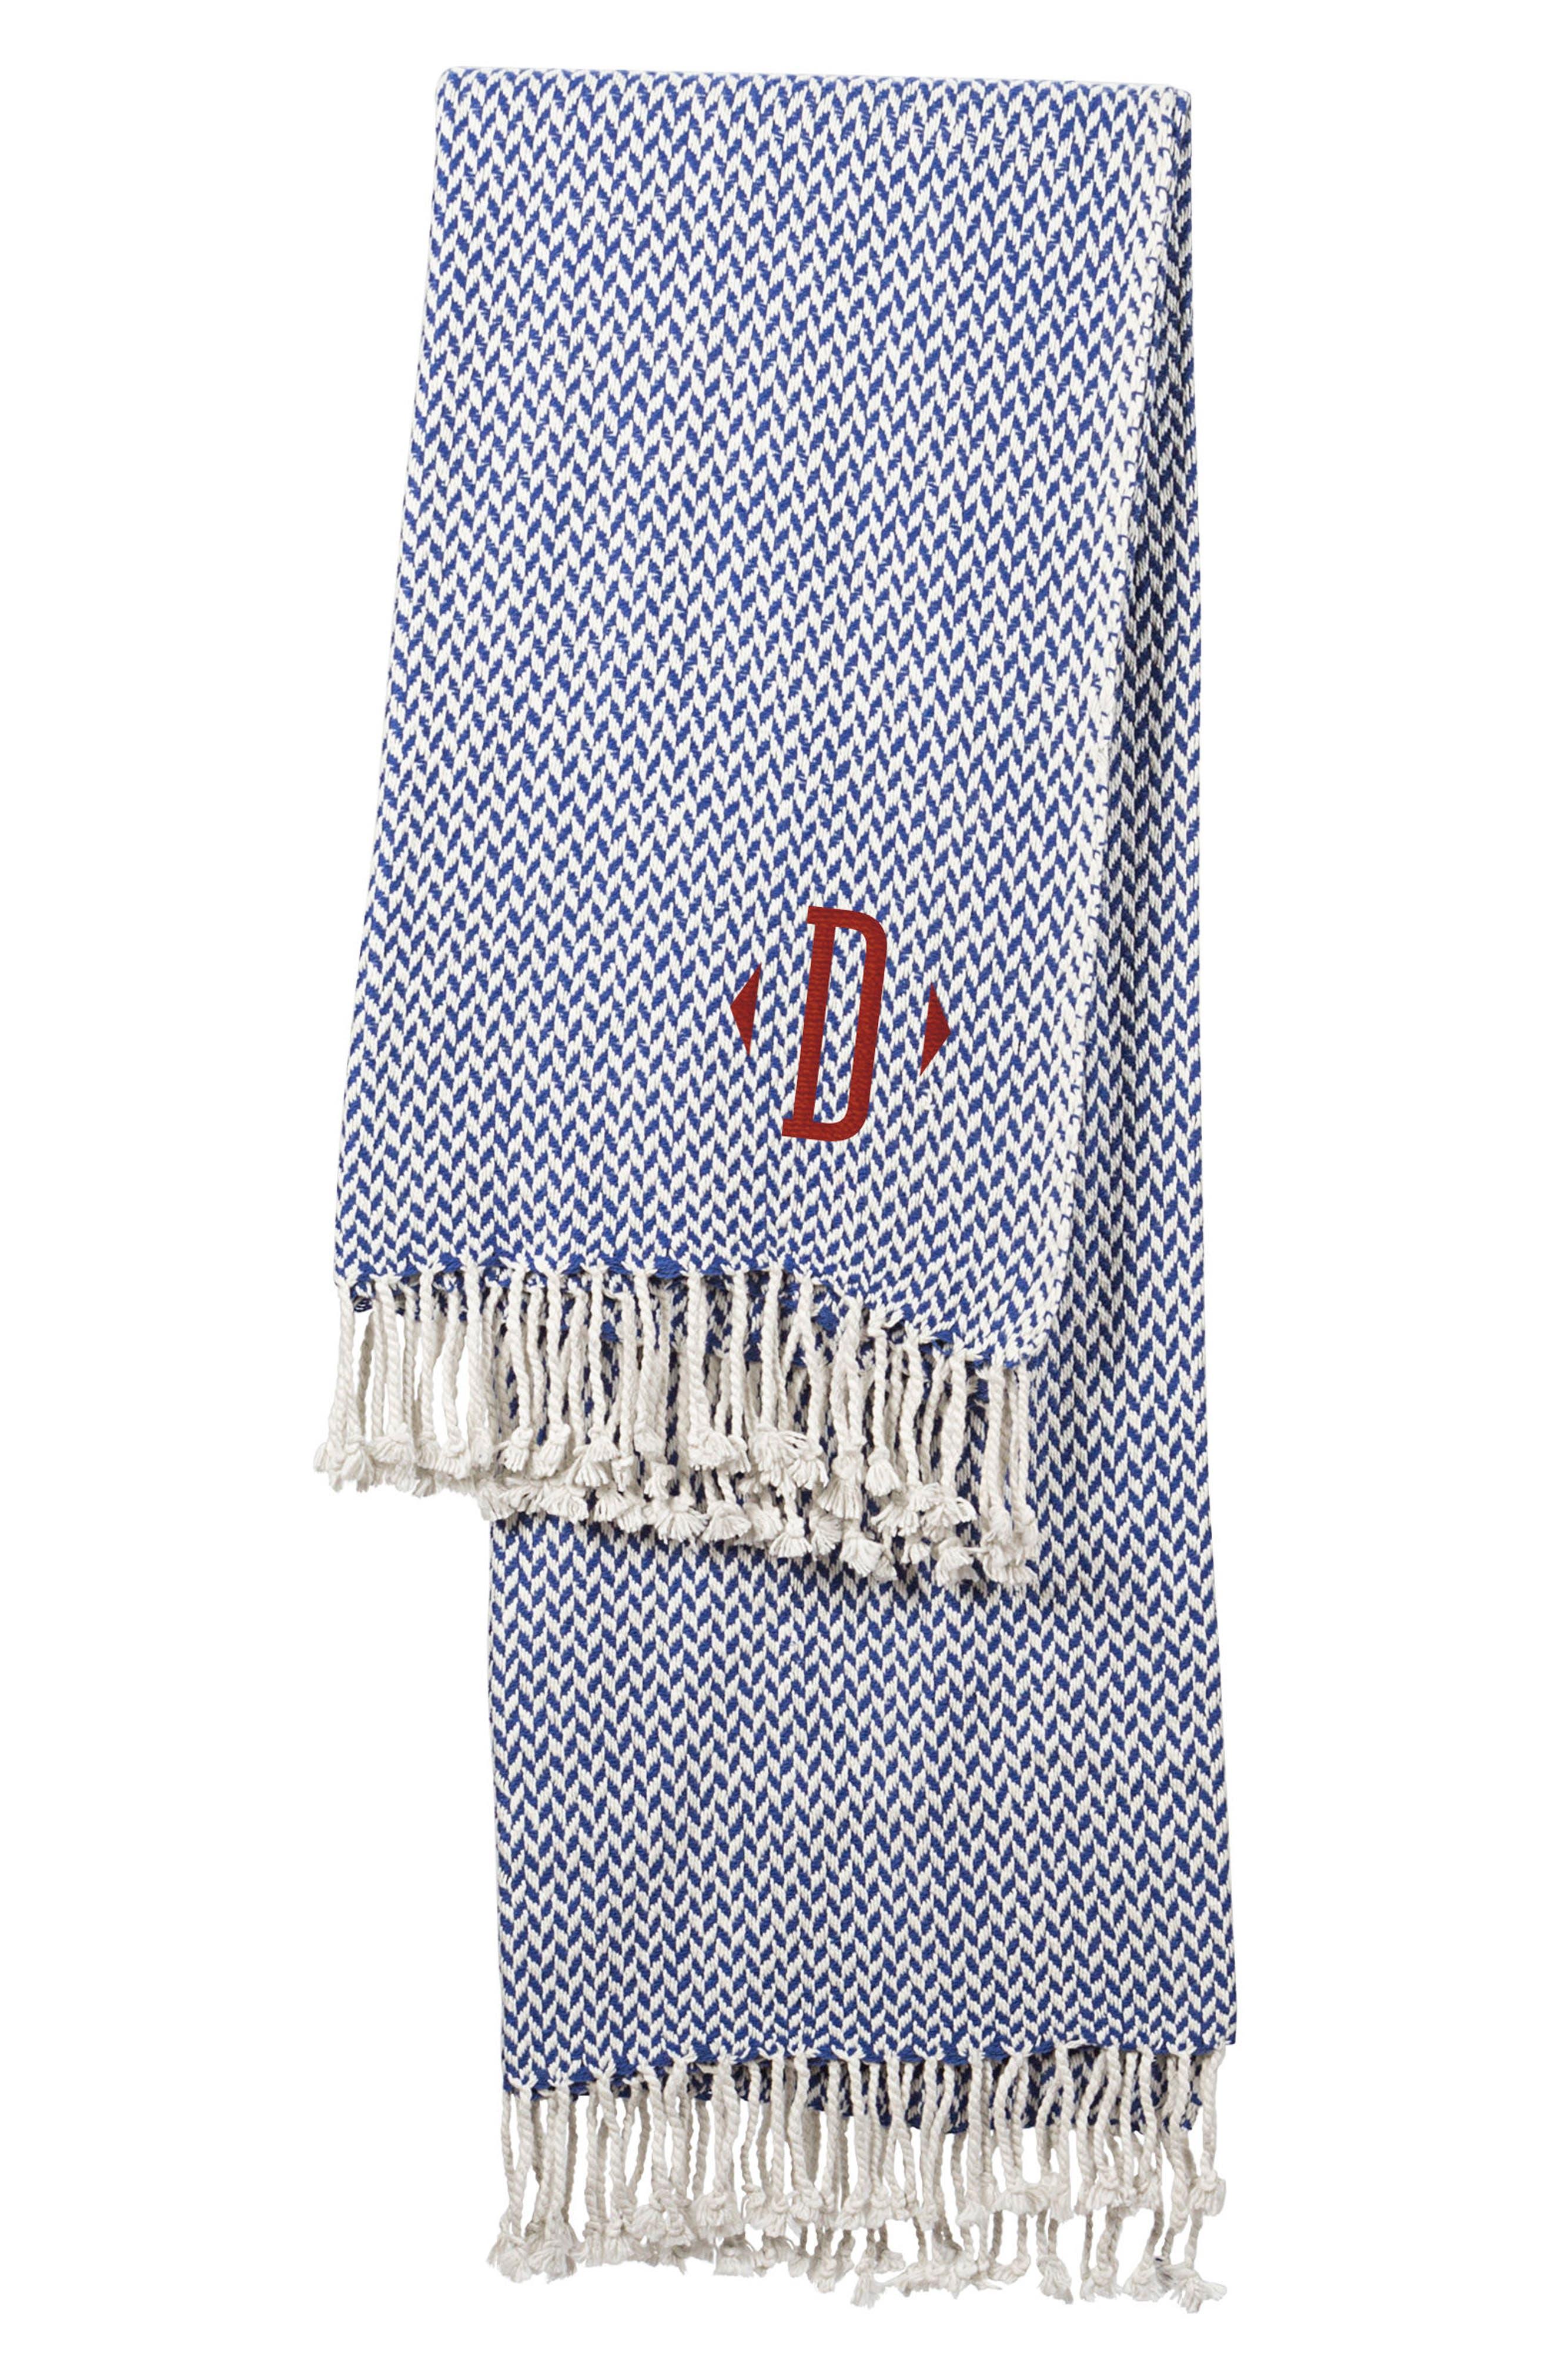 Monogram Herringbone Throw Blanket,                         Main,                         color, Blue-D